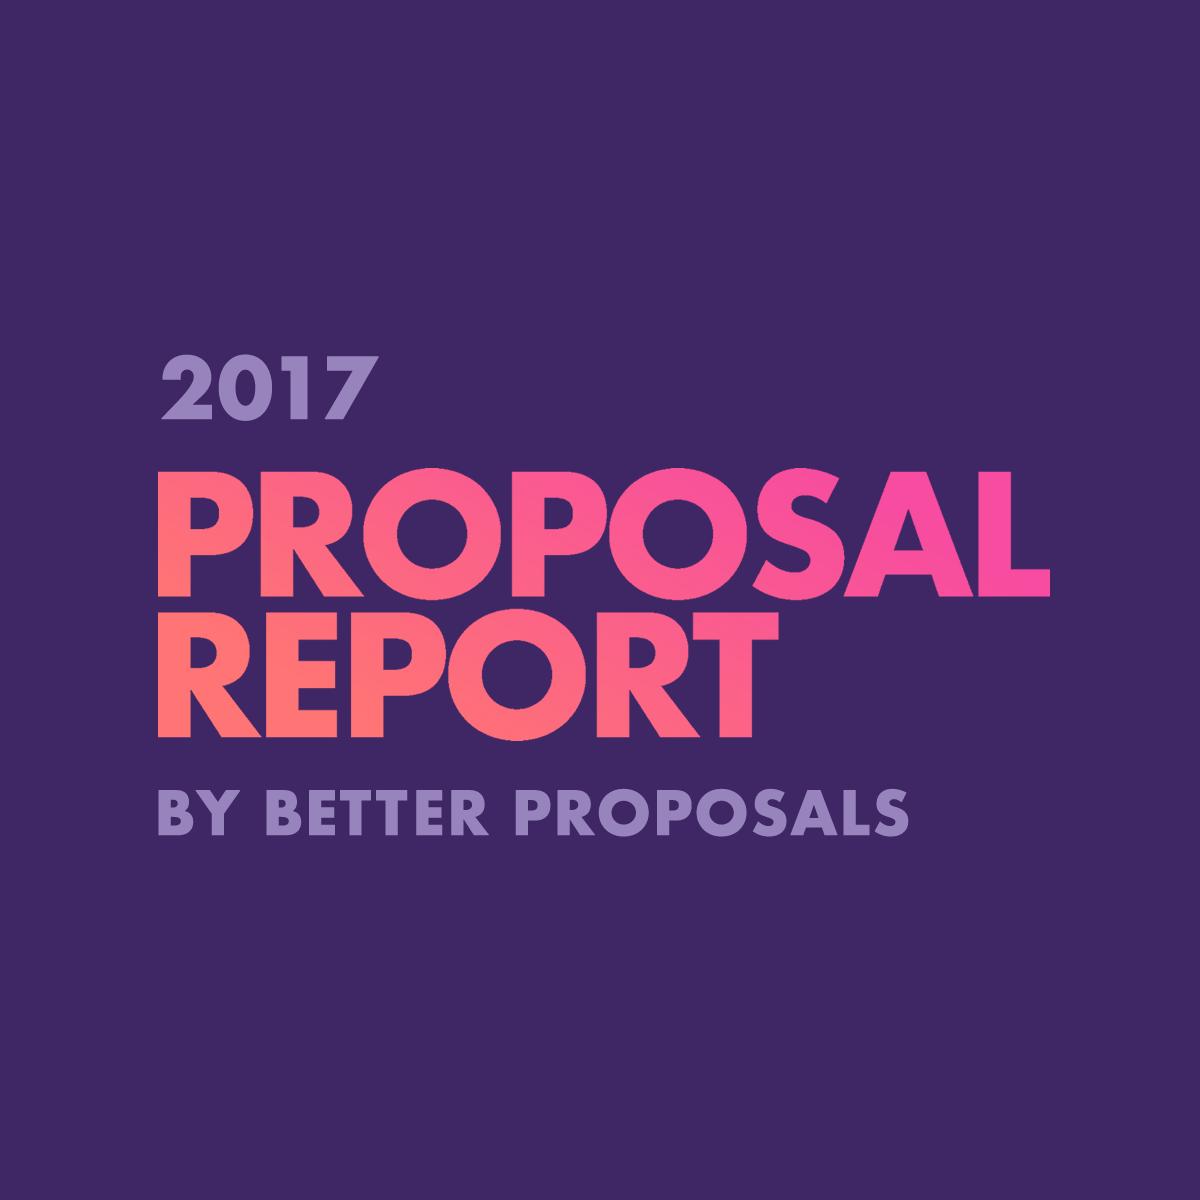 2017 Proposal Report – Better Proposals